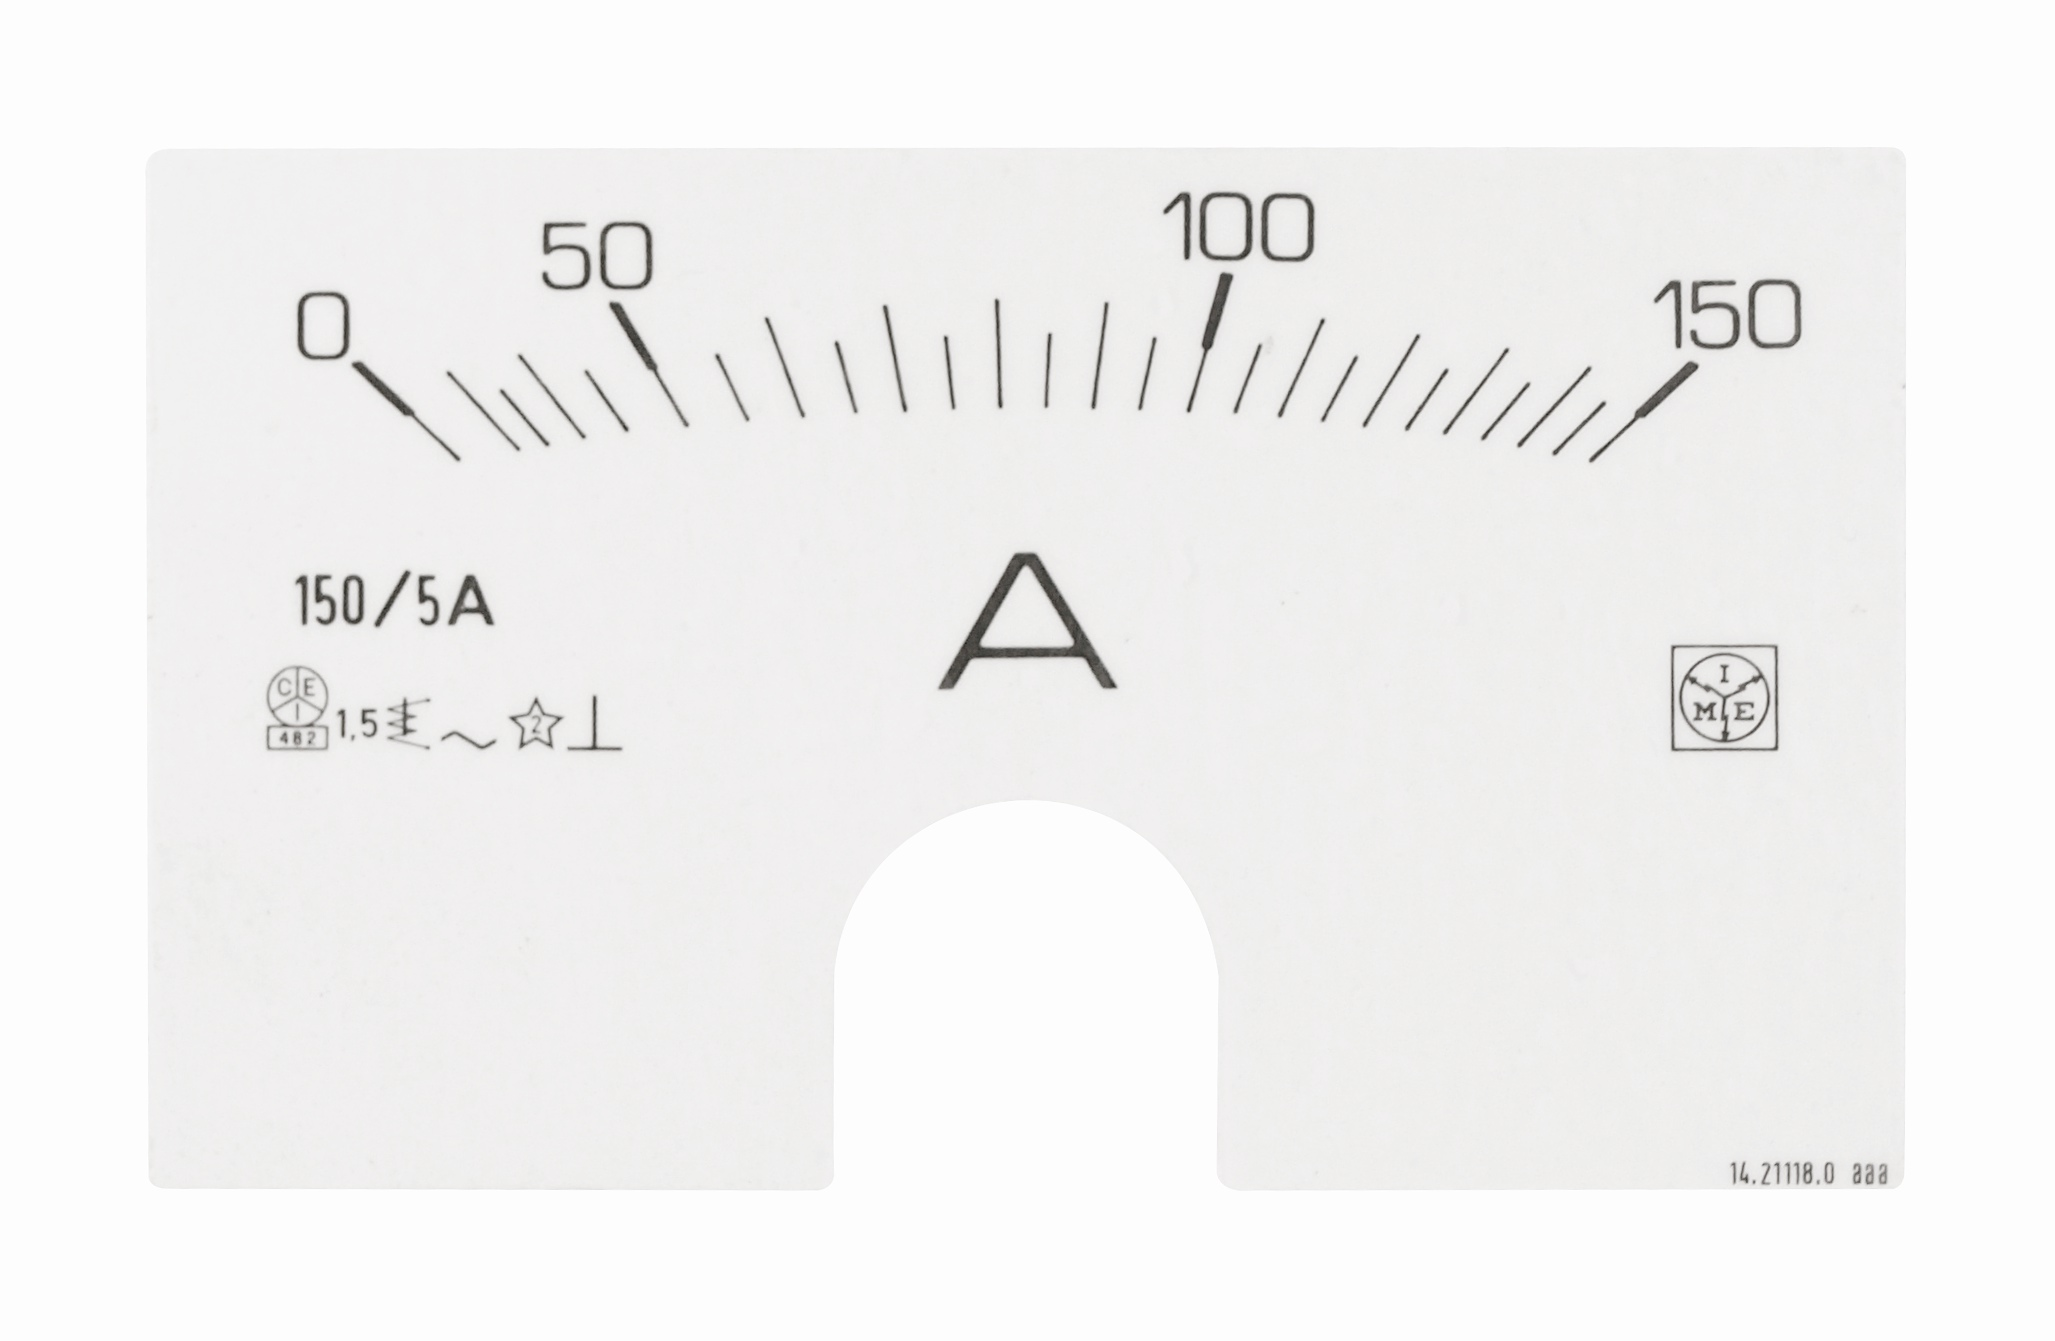 1 Stk Wechselskala für Reiheneinbau-Messgeräte 150A/5A MG95A150--